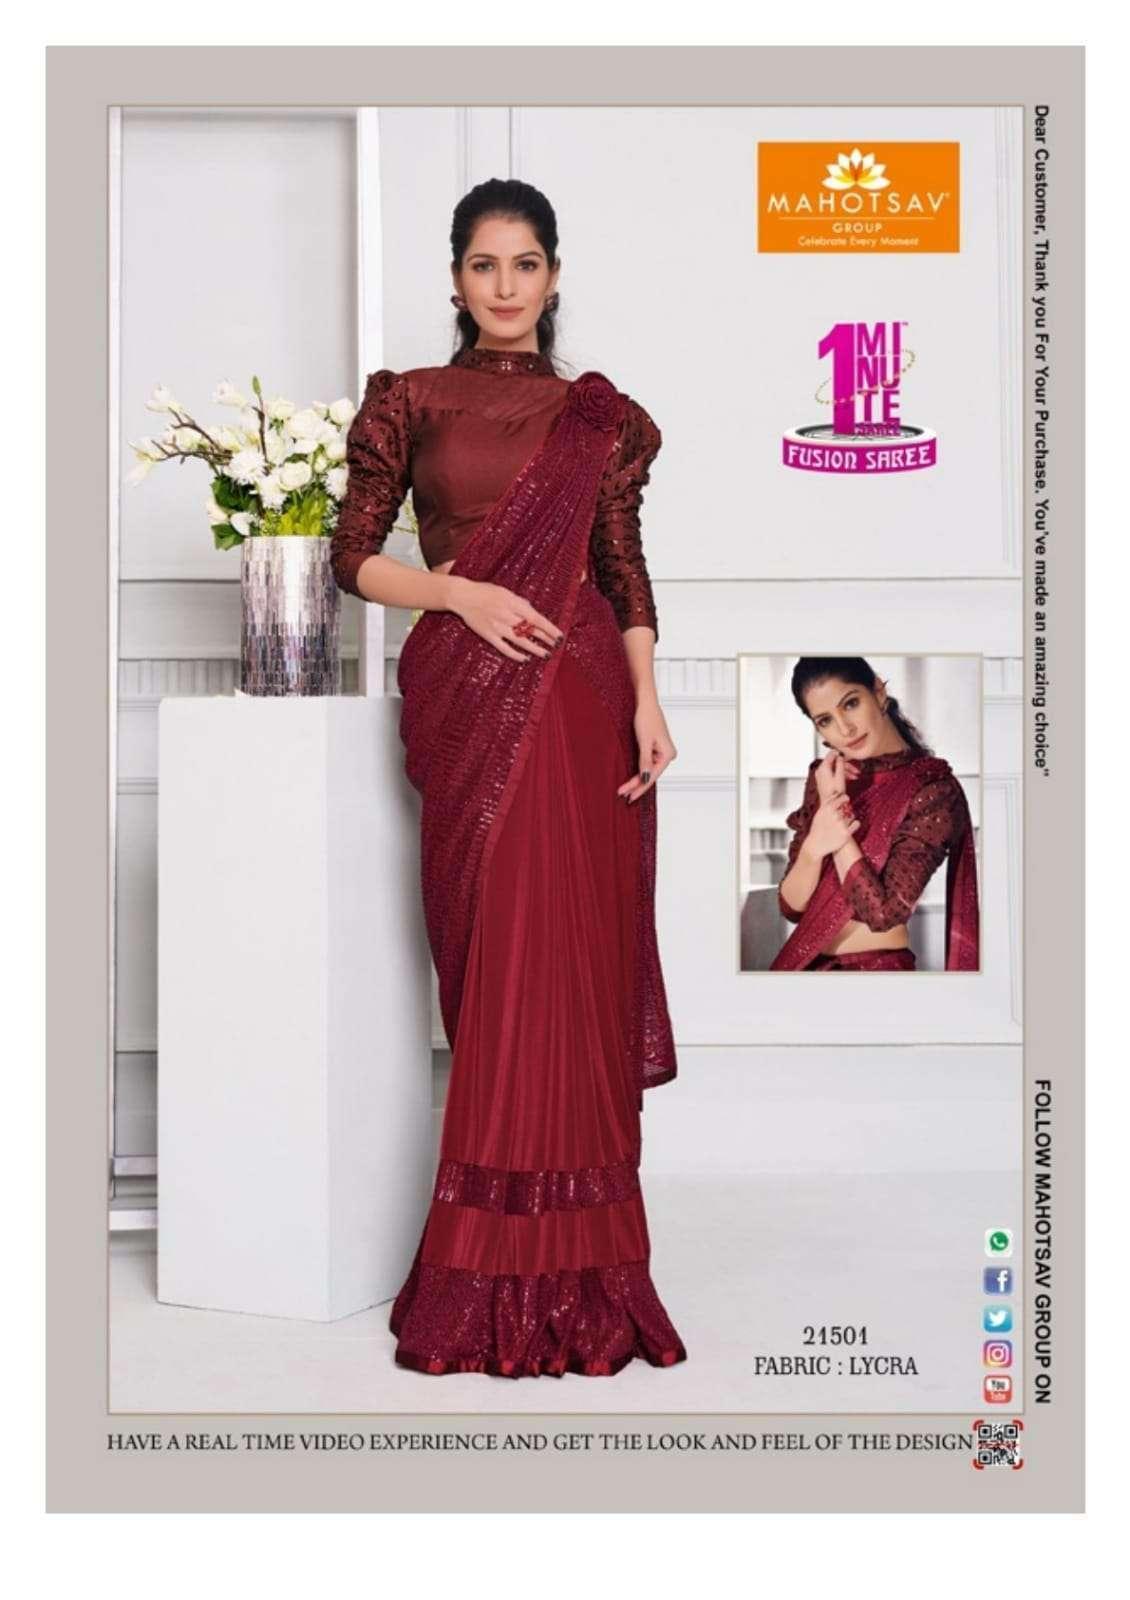 Mahotsav Moh Manthan Izzara 21501 To 215018 Series Fancy Designer Sarees Collection 21501